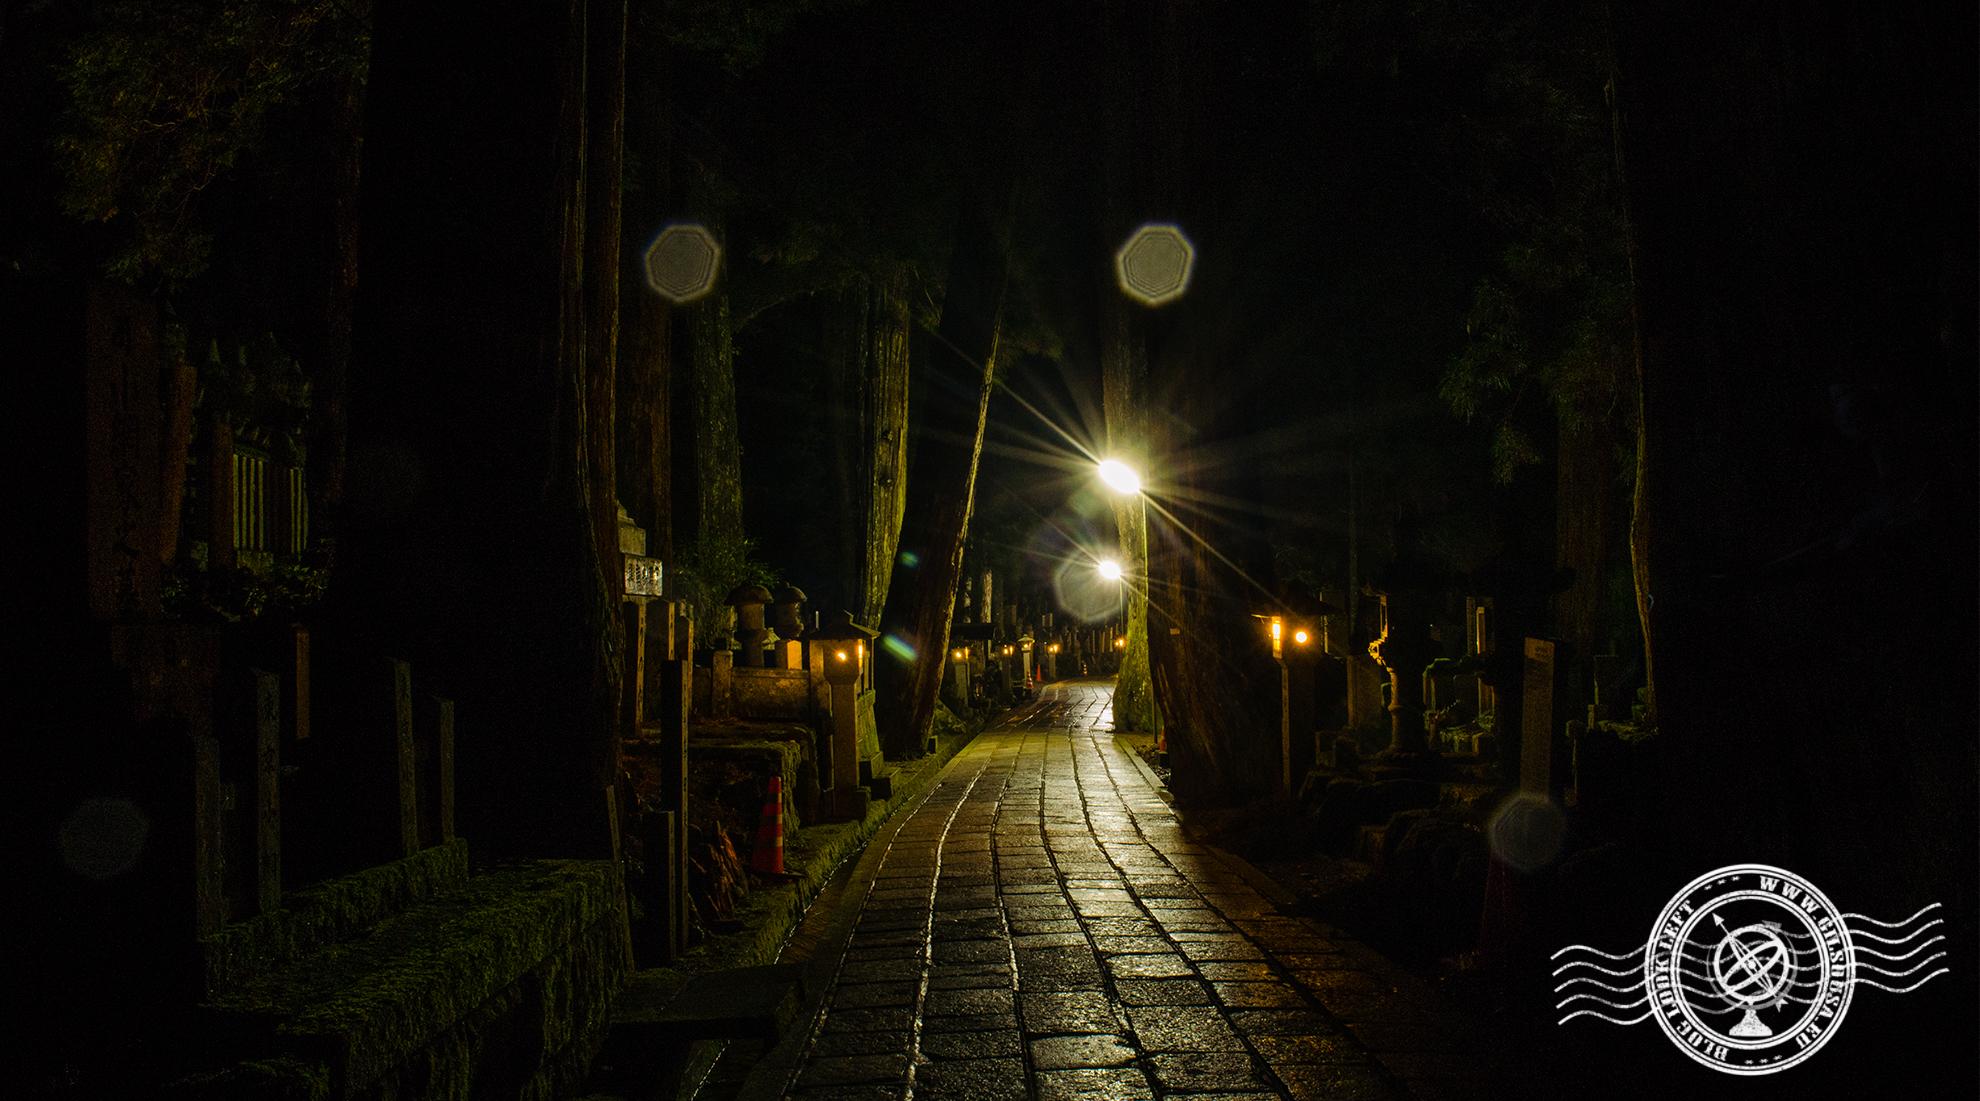 Okunoin Graveyard at night